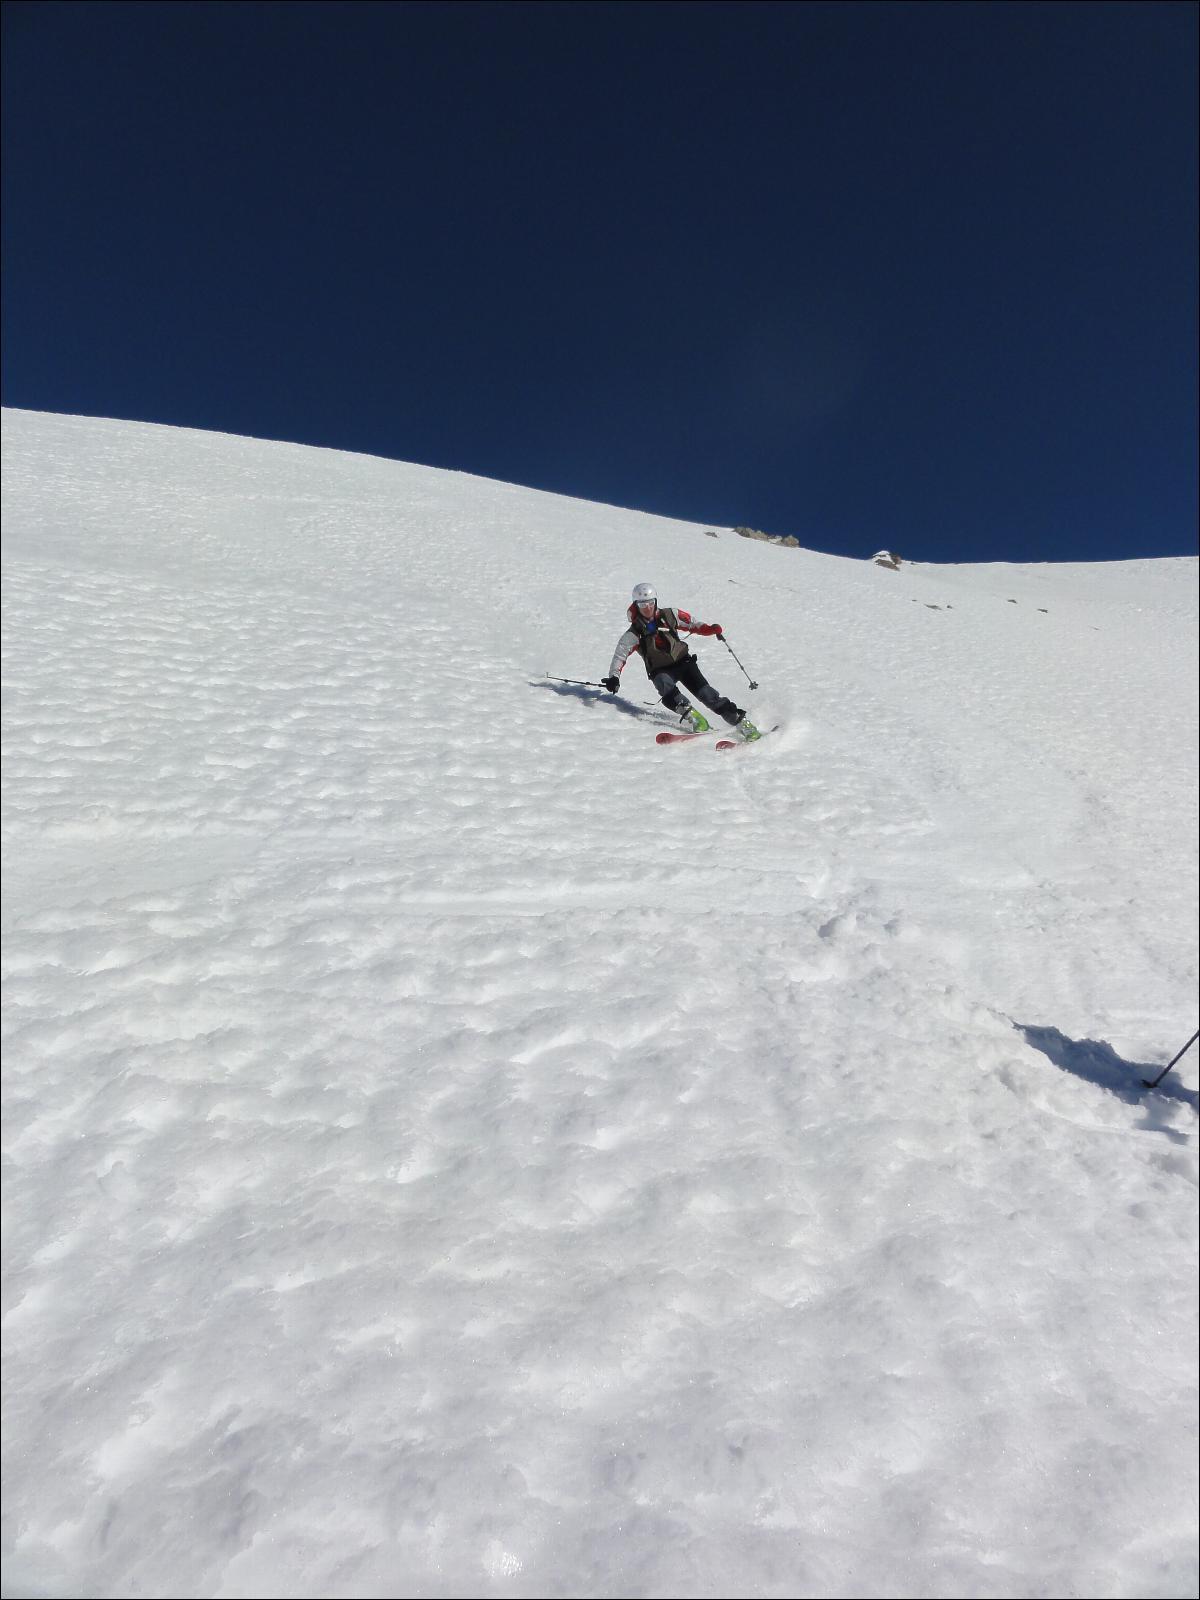 357bfaa088 ... Monte Bianco à ski de rando